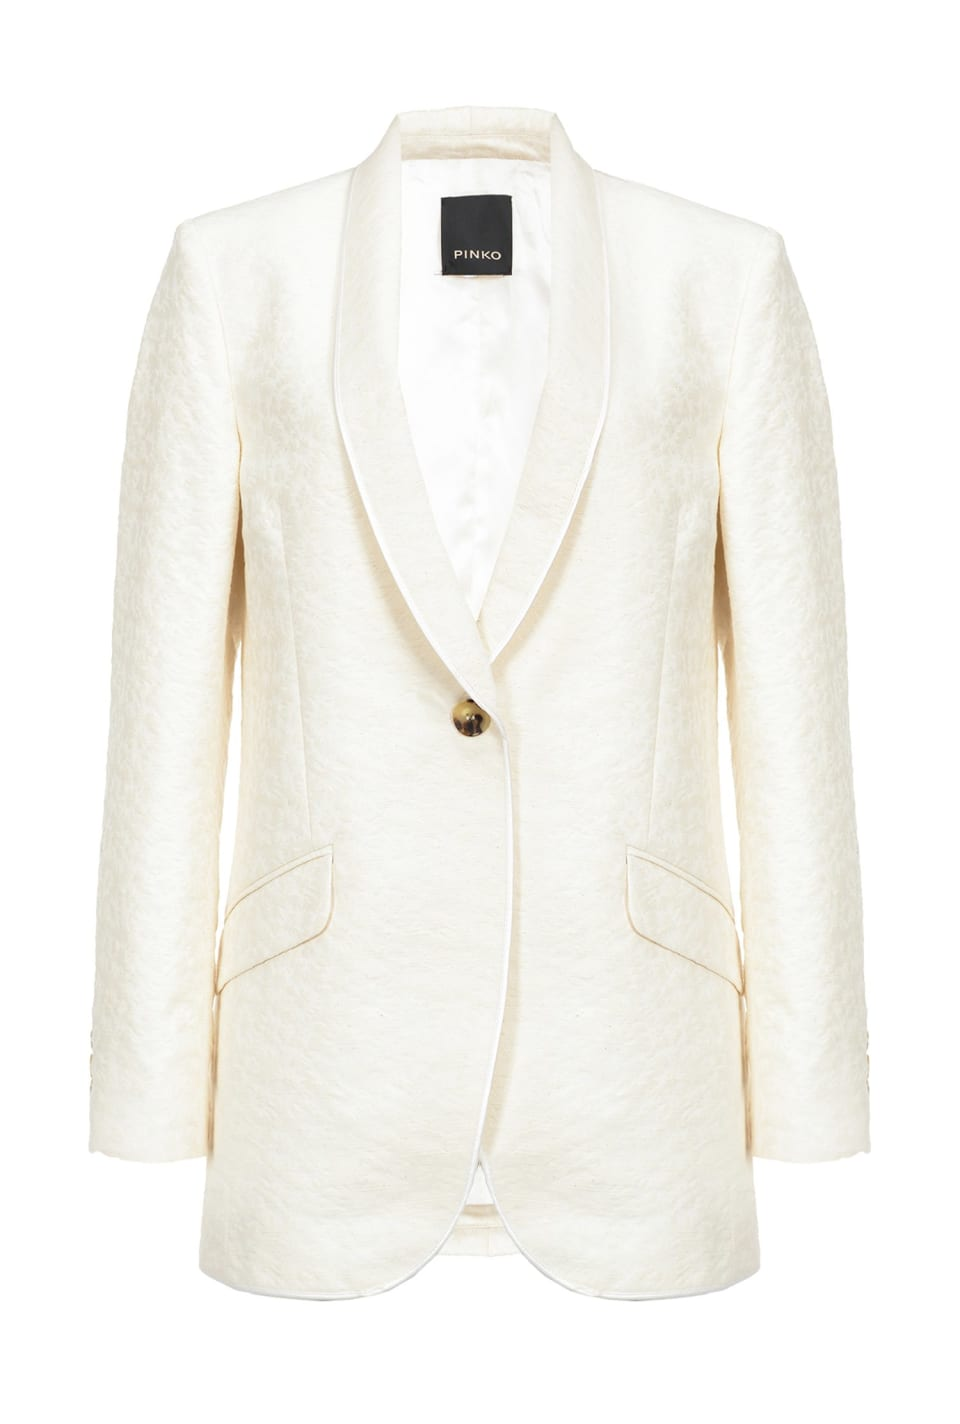 Jacquard blazer - Pinko